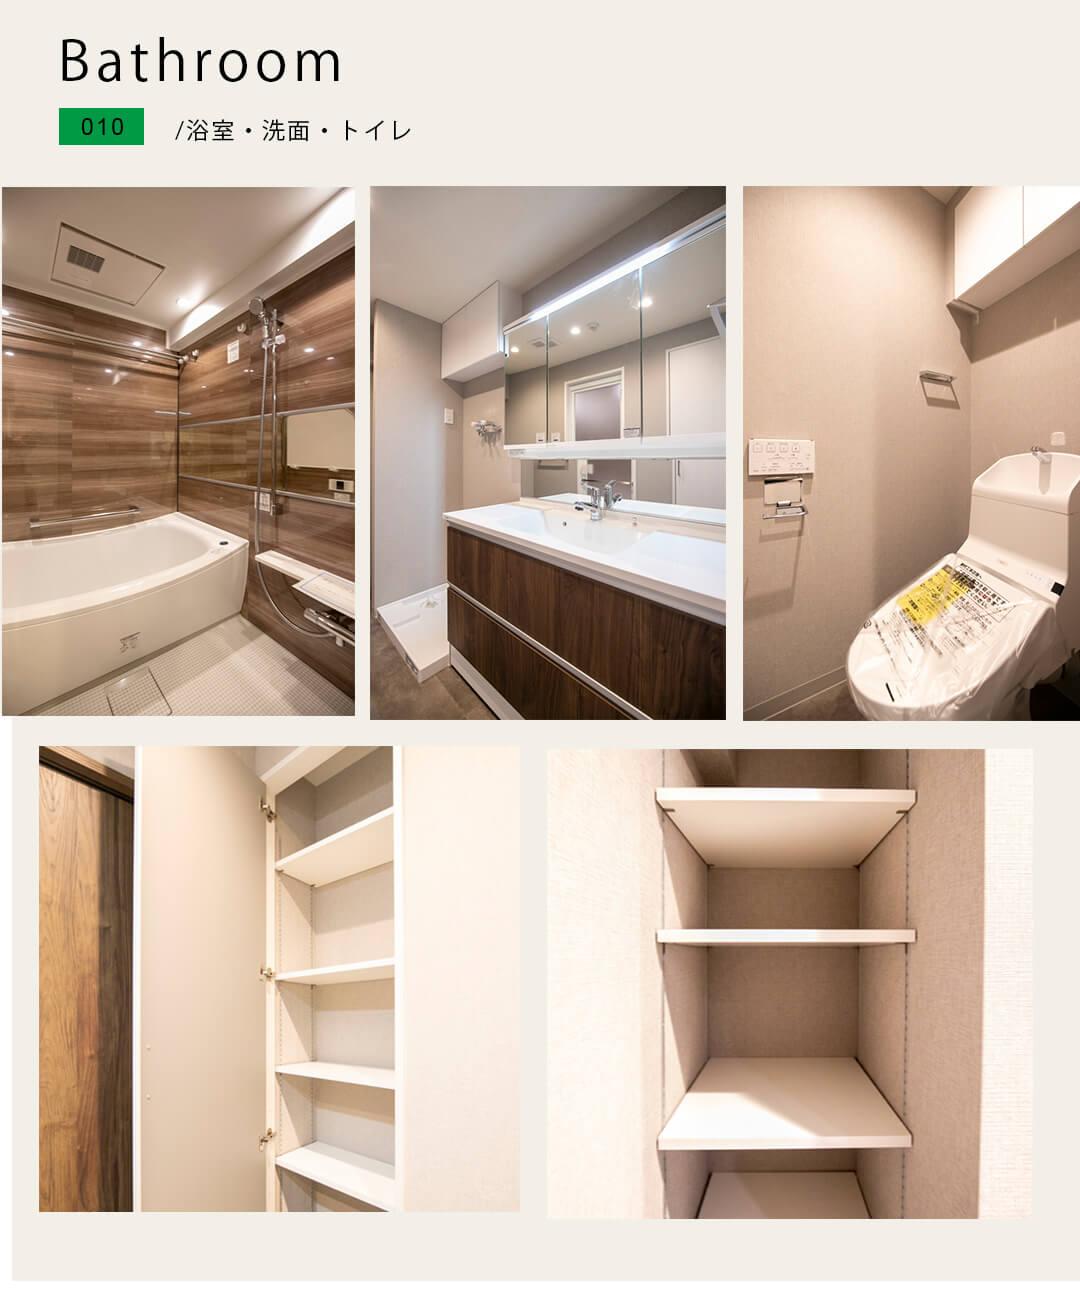 010,bathroom,浴室,洗面,トイレ